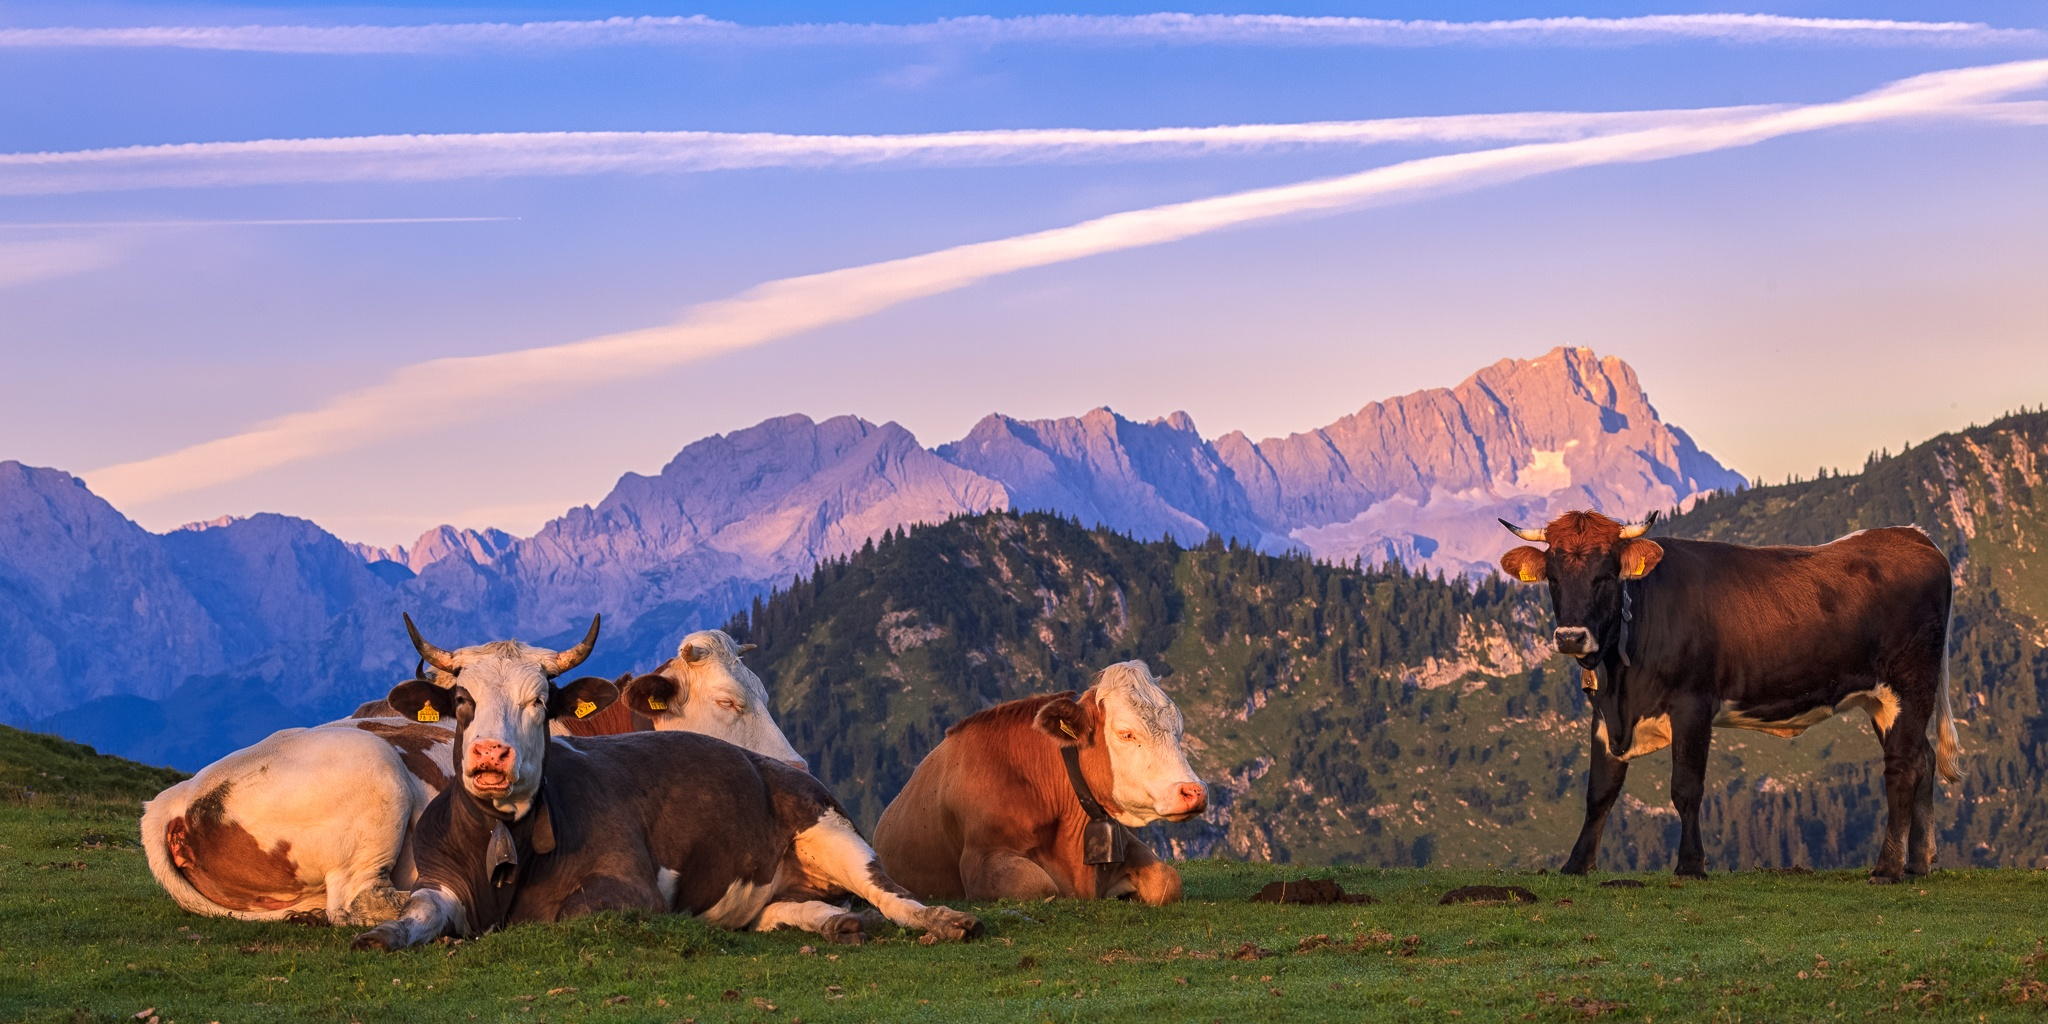 Kuh, kälber, Rinder, Jungvieh, Morgen, Simetsberg, Estergebirge